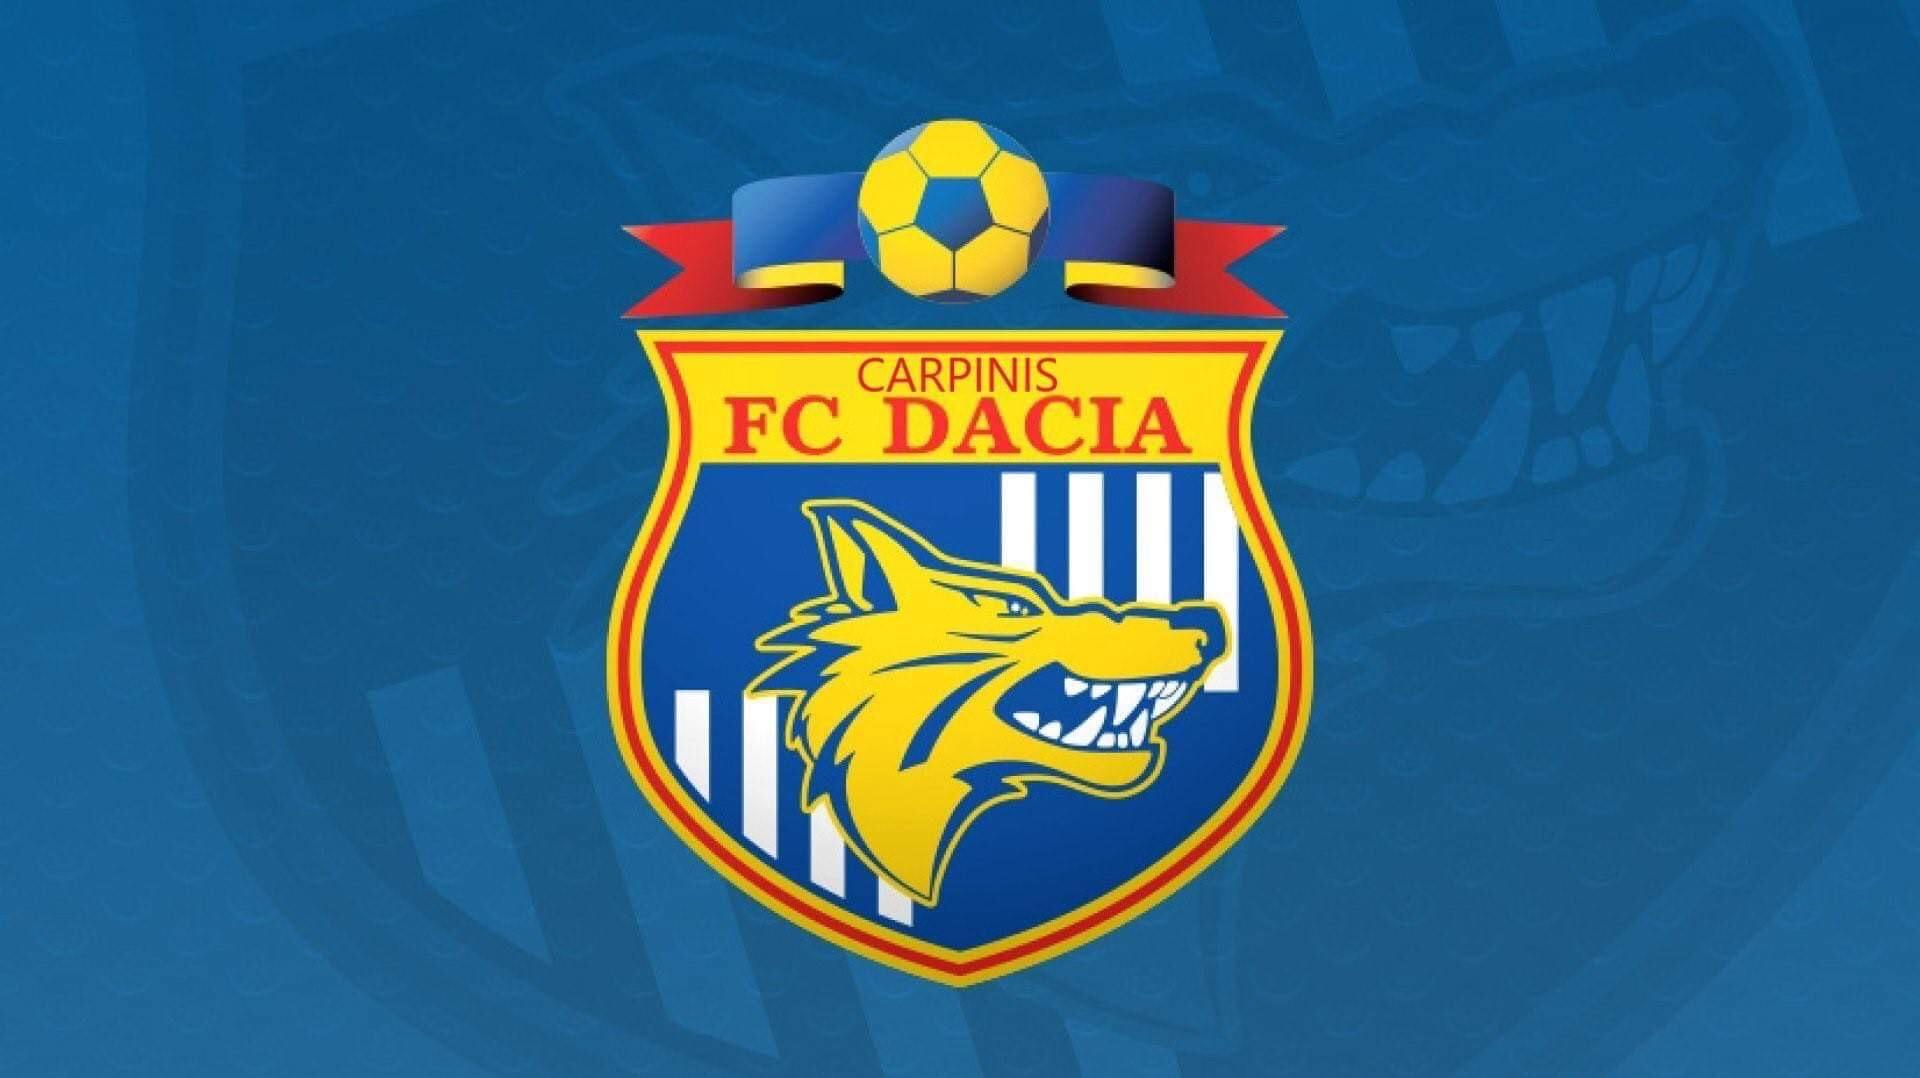 Dacia Carpinis - Echipă